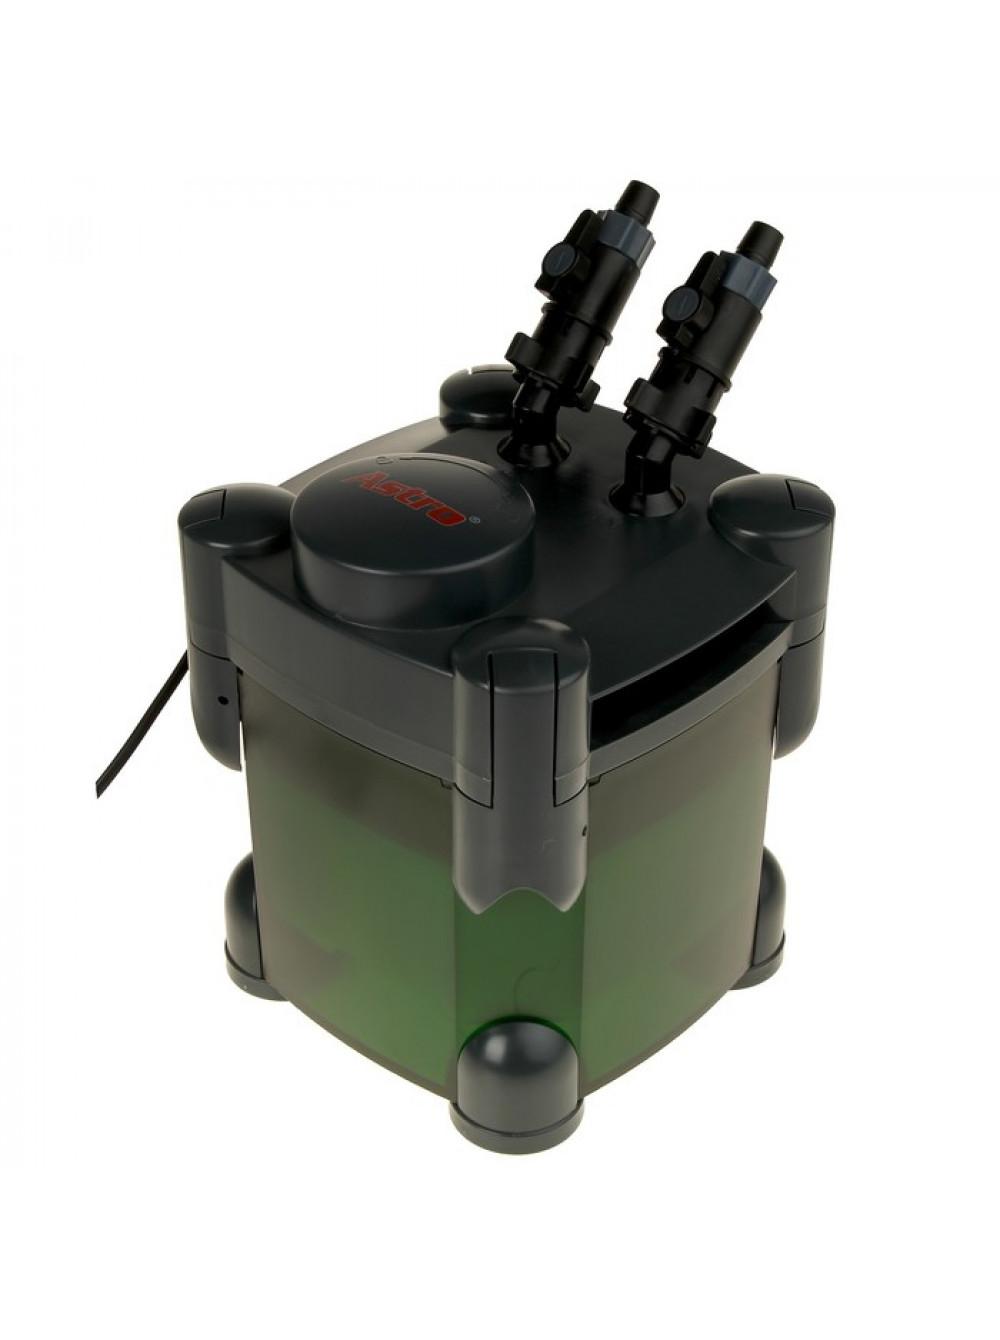 Фильтр для аквариума внешний KW ZONE Astro